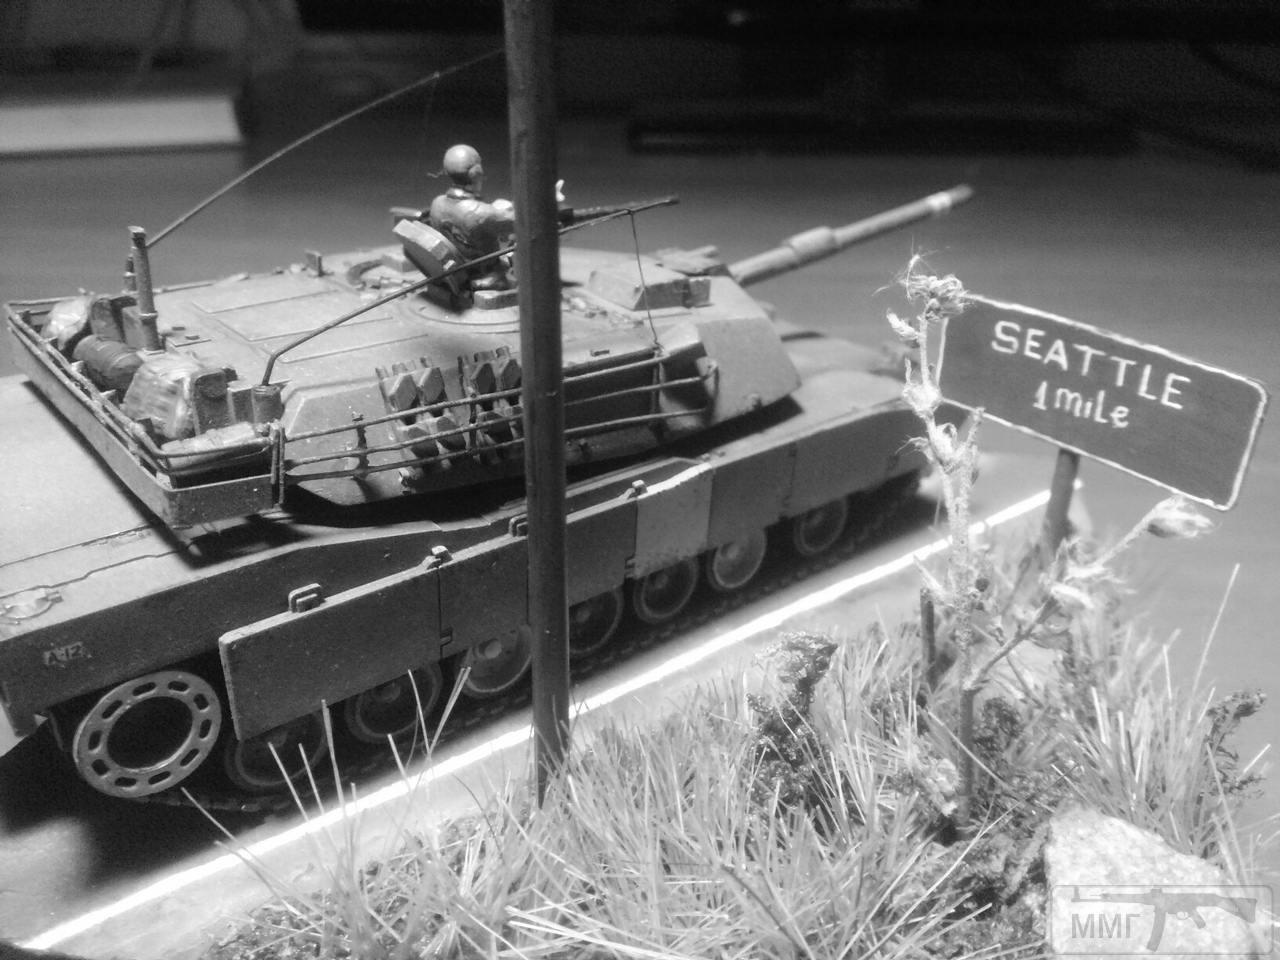 40188 - Модели бронетехники